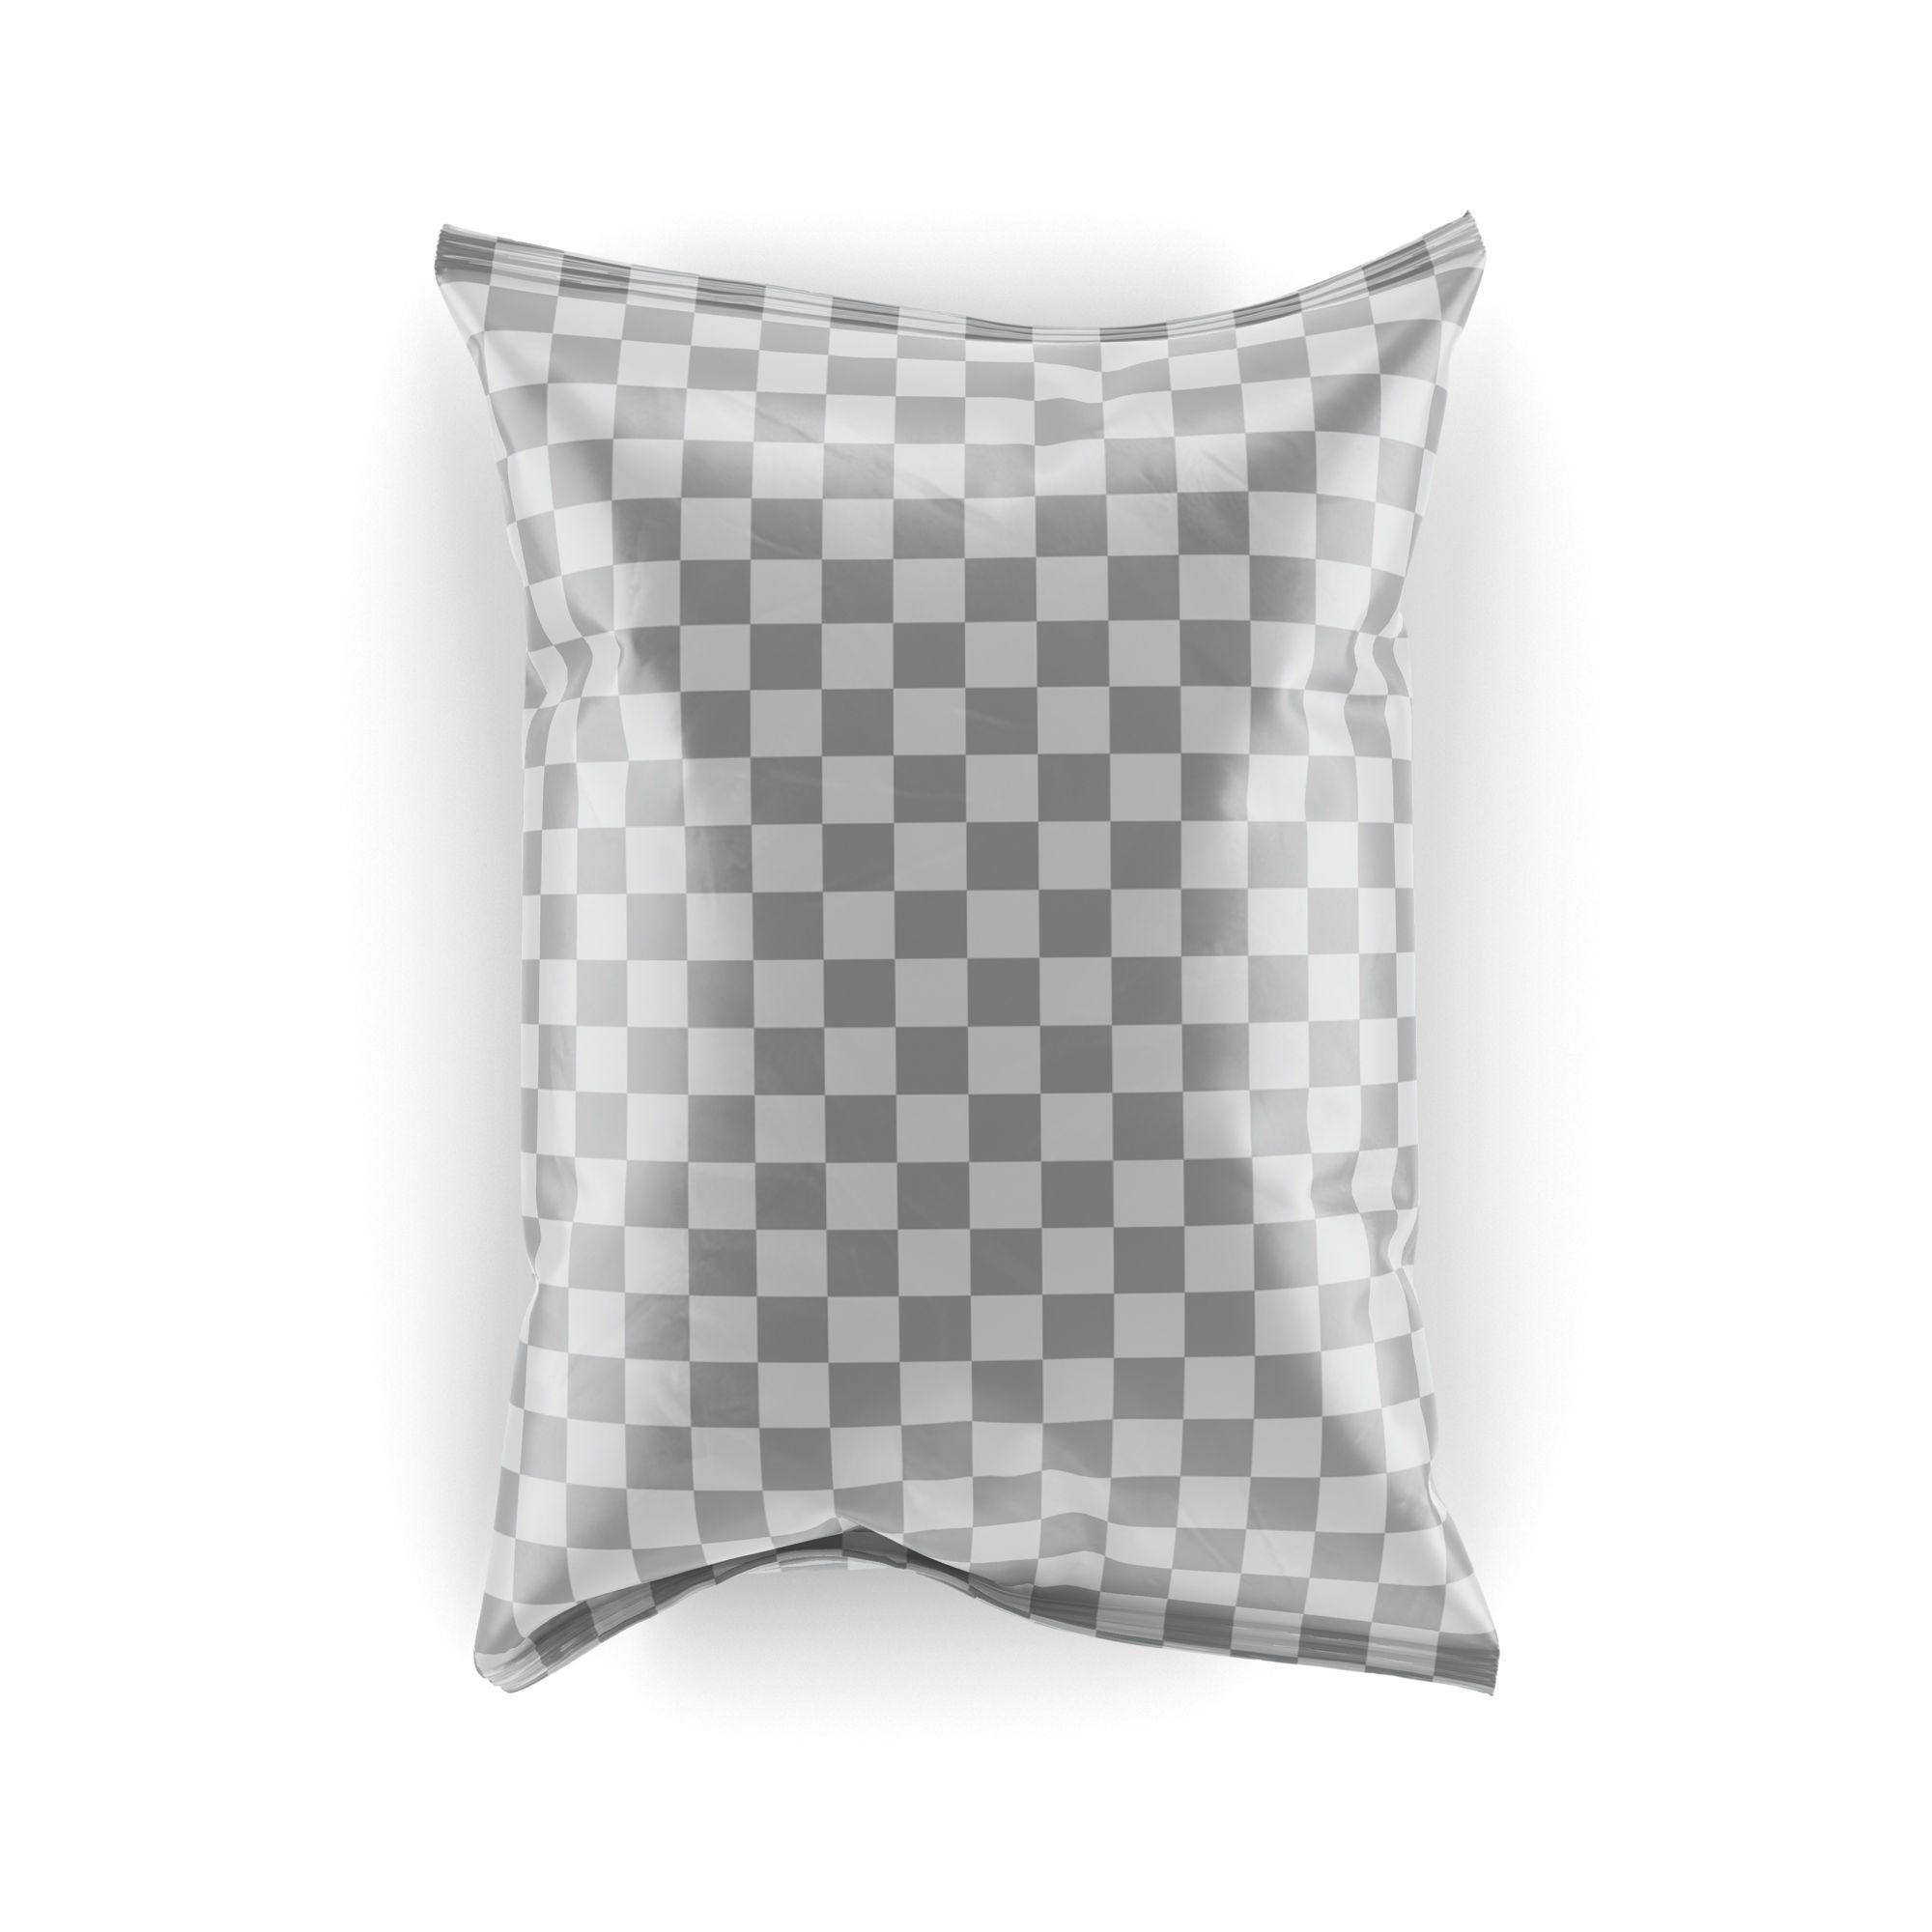 Download Chips Bag Mockup Set Glossy Matte Bag Mockup Chip Bag Throw Pillows